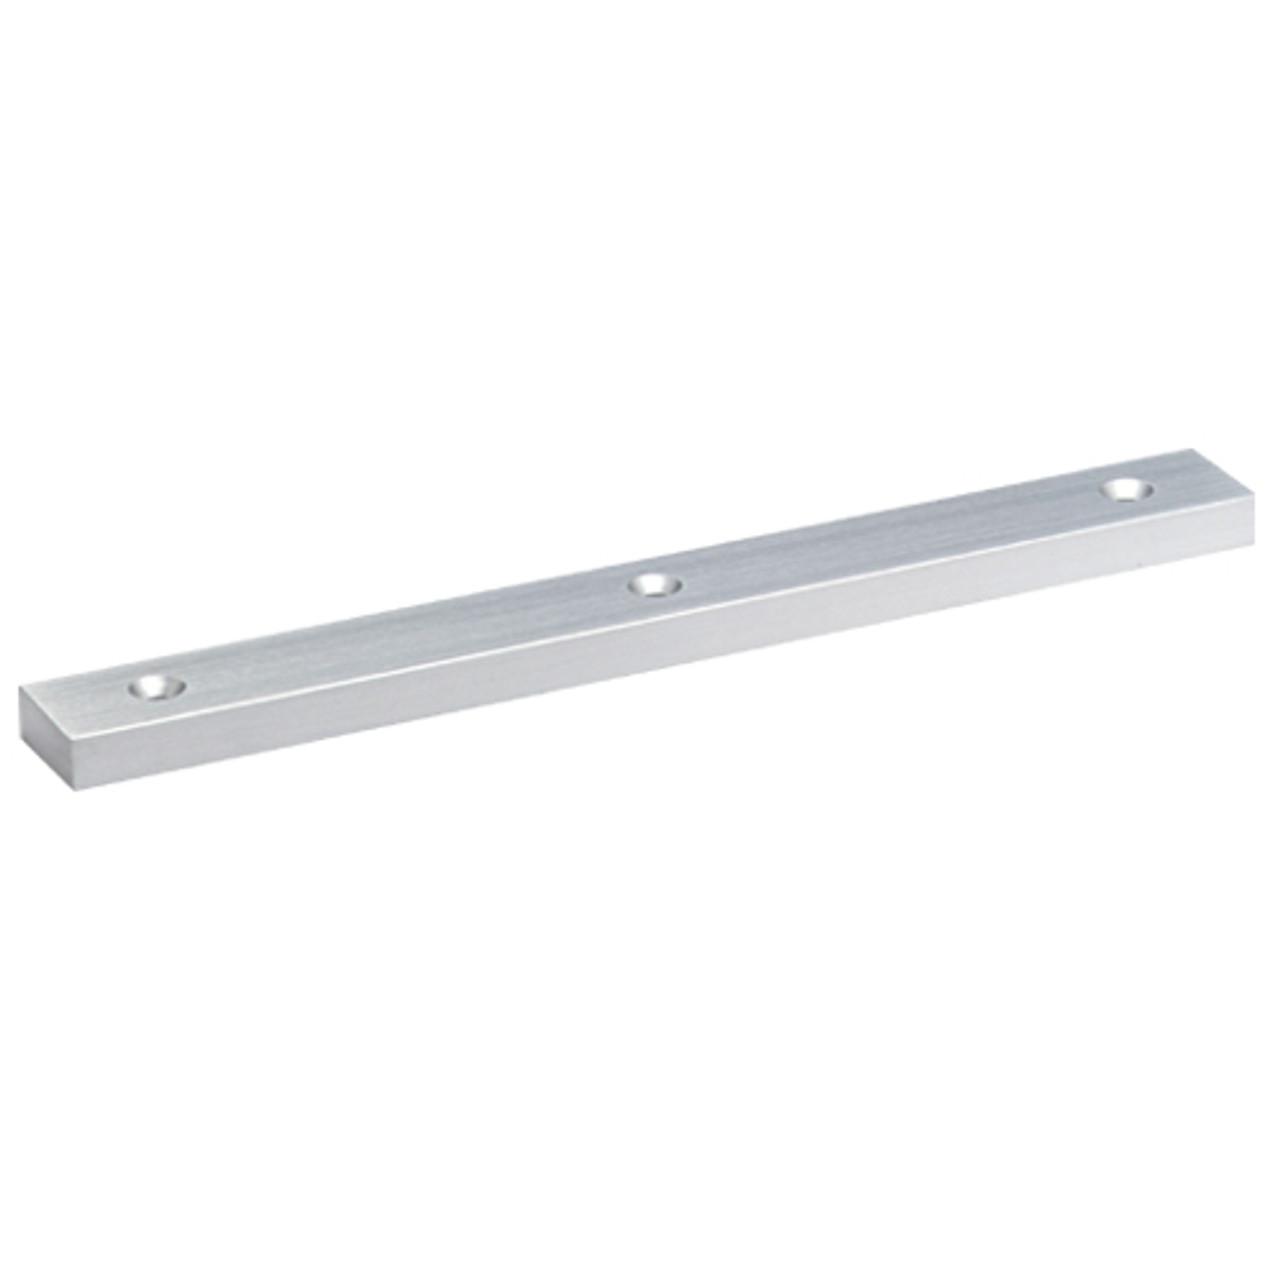 4411-US26 DynaLock 4000 Series Filler Plates for Single Maglocks in Bright Chrome